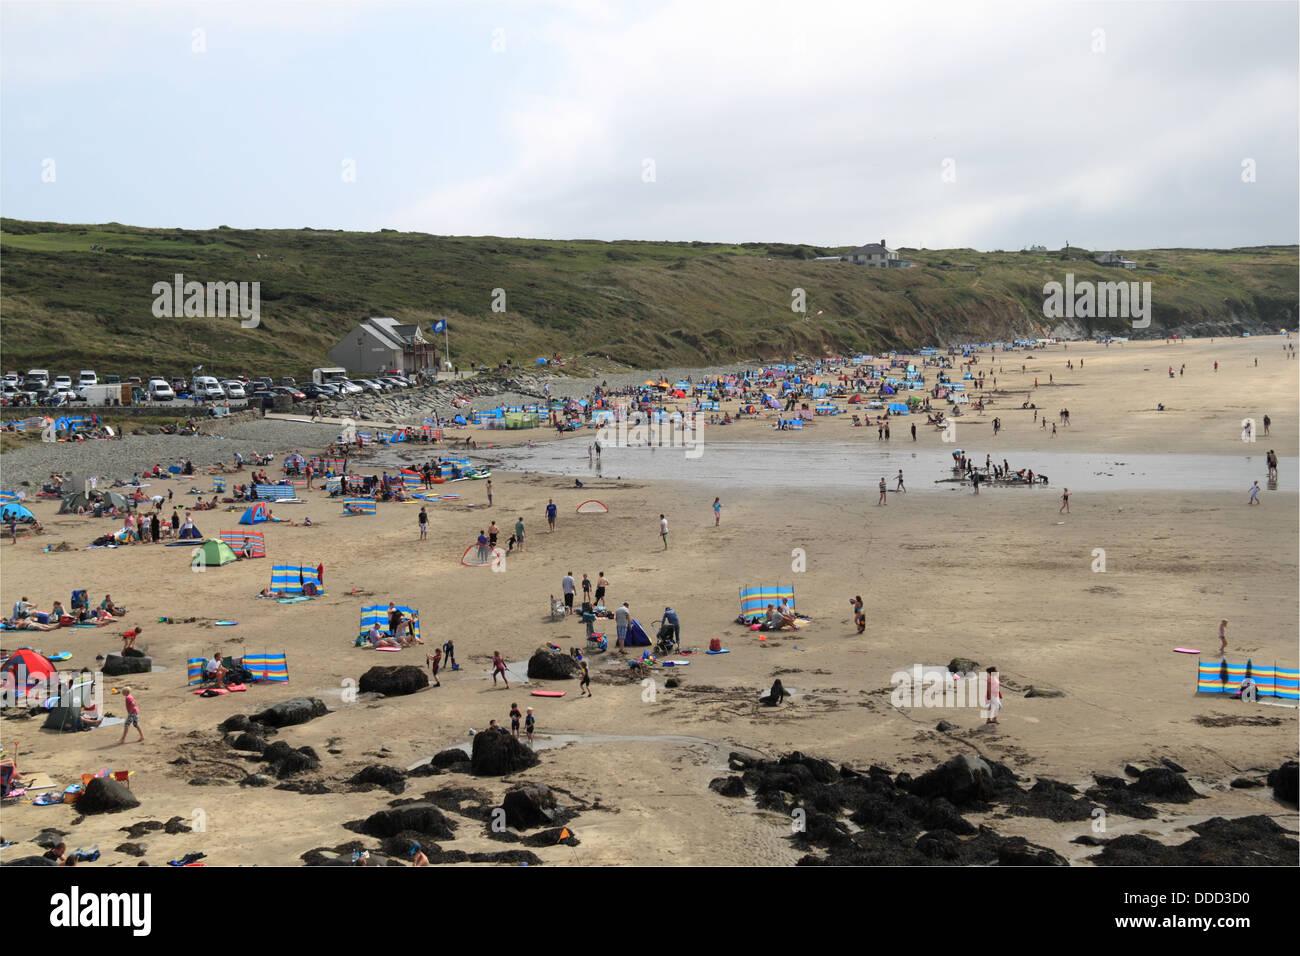 Whitesands Bay, St Davids, Pembrokeshire, Wales, Great Britain, United Kingdom, UK, Europe - Stock Image